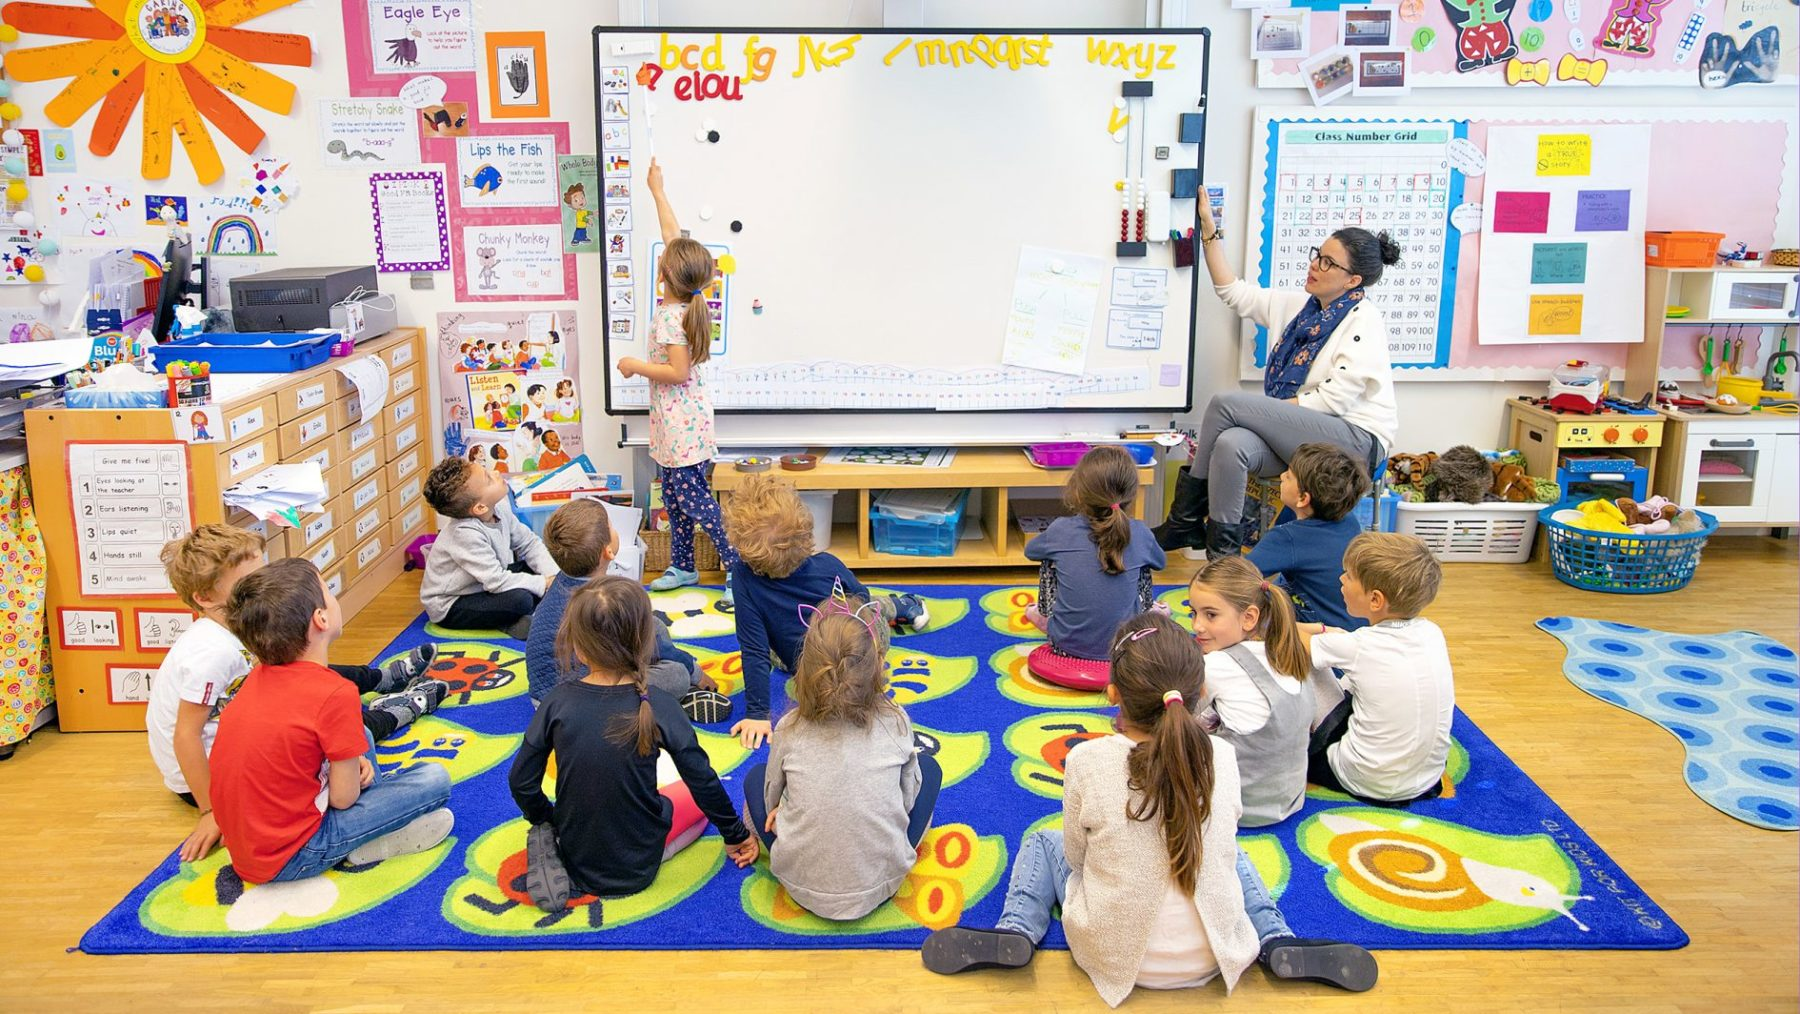 Primary class with teacher